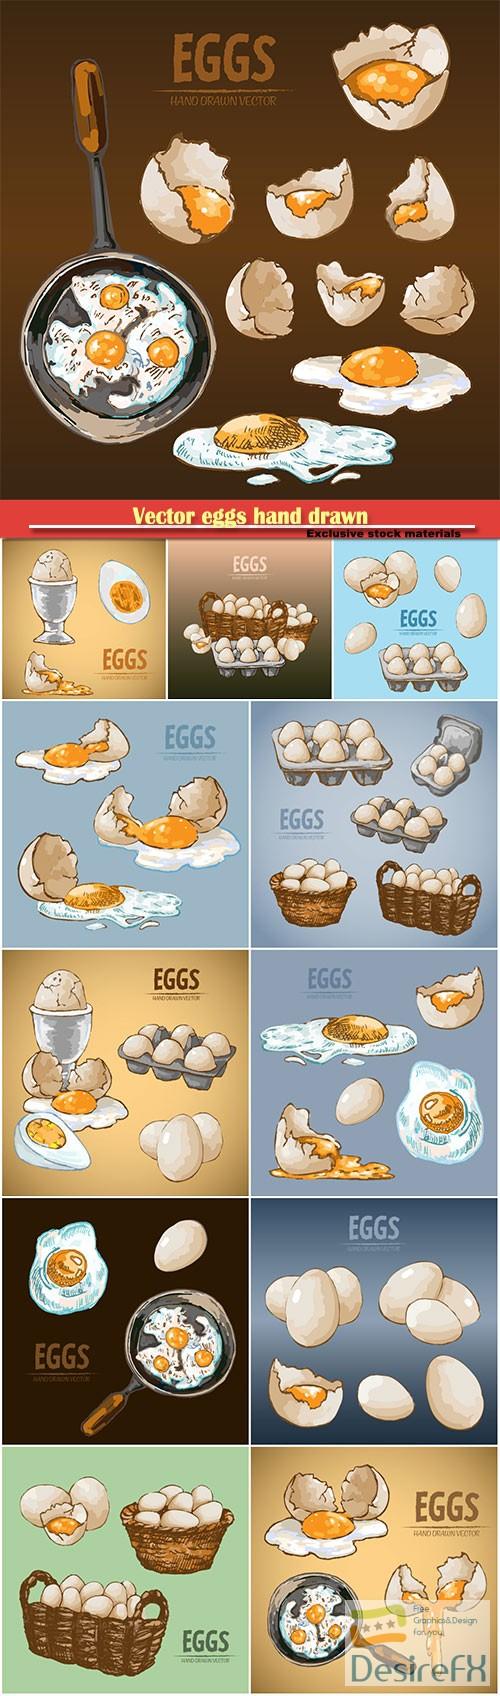 Vector eggs hand drawn retro illustration